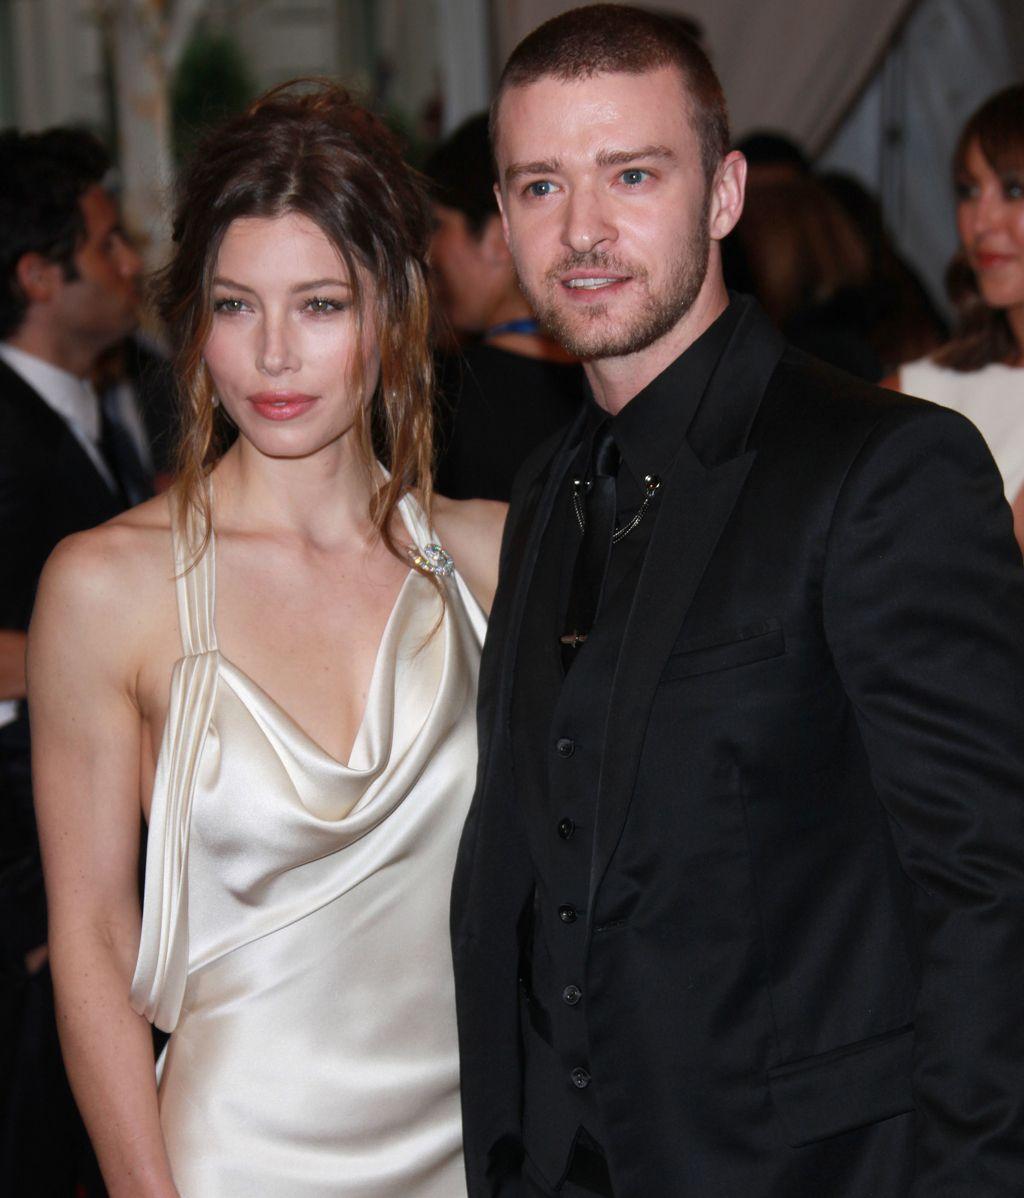 Justin Timberlake y Jessica Biel se dejan fotografiar juntos